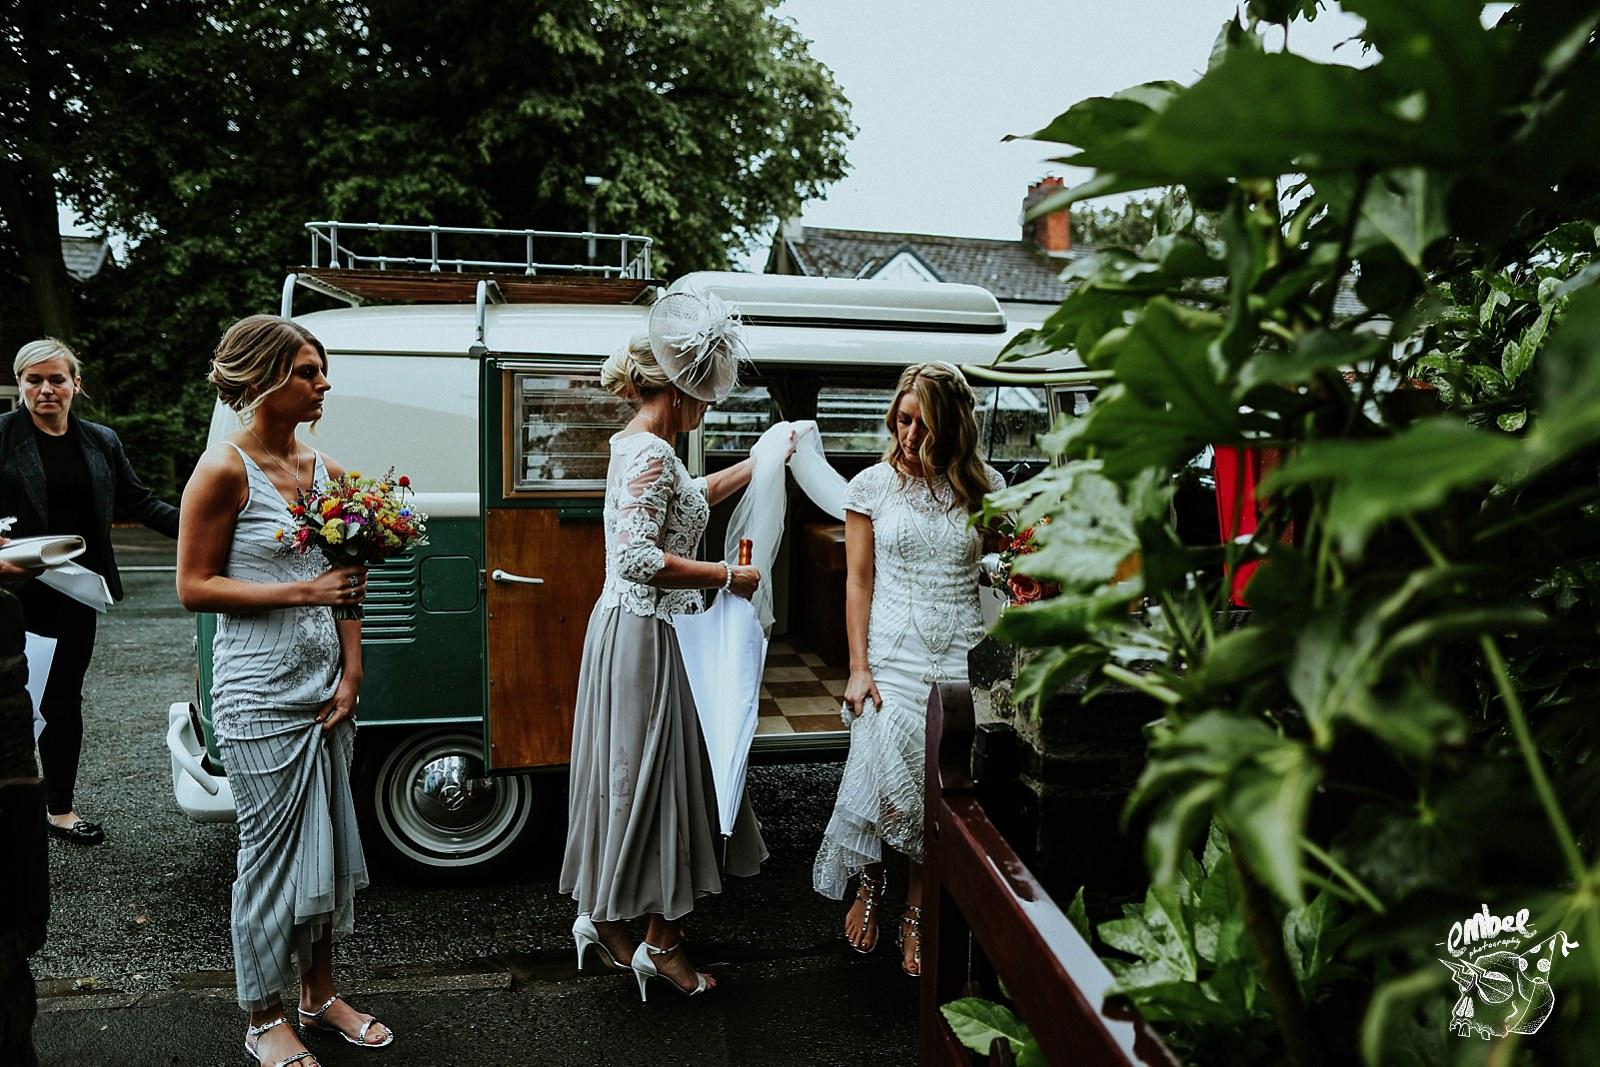 brides arrives at church